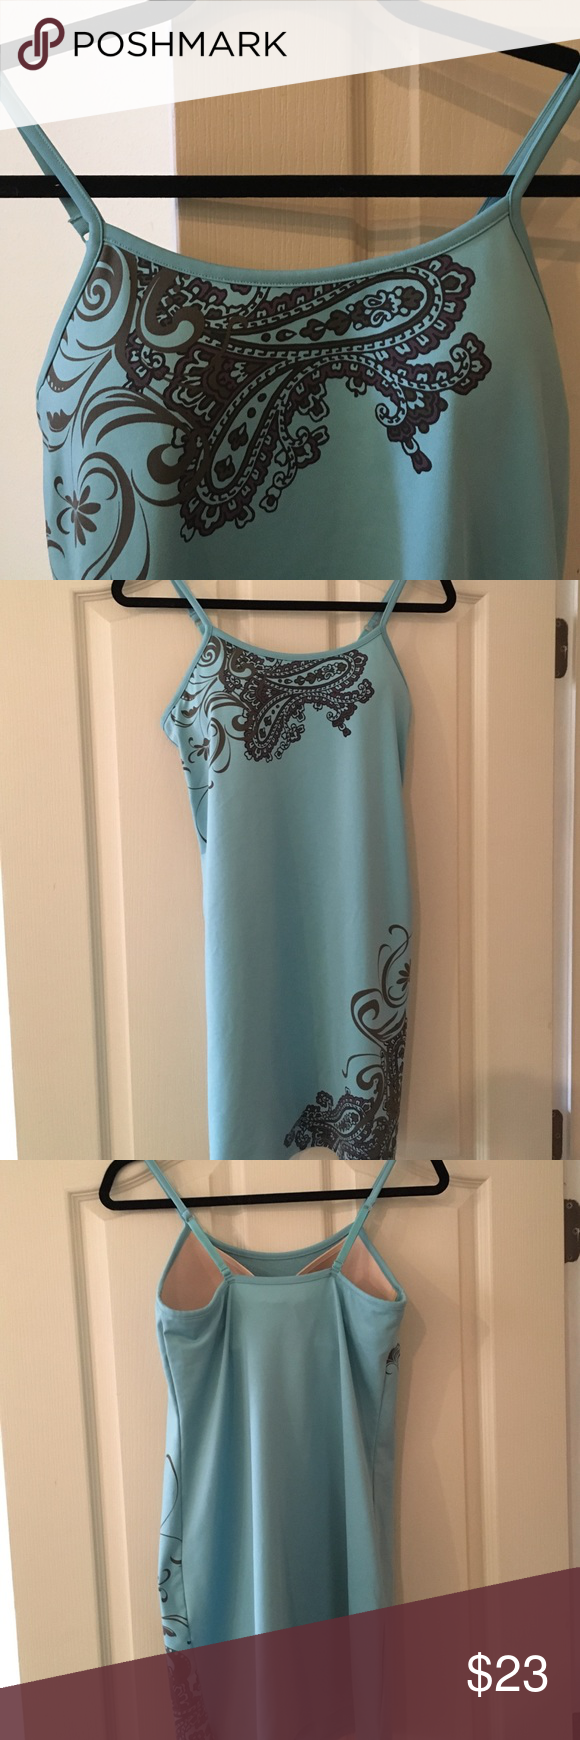 Athleta Summer Dress W Built In Bra Summer Dresses Clothes Design Swim Dress [ 1740 x 580 Pixel ]